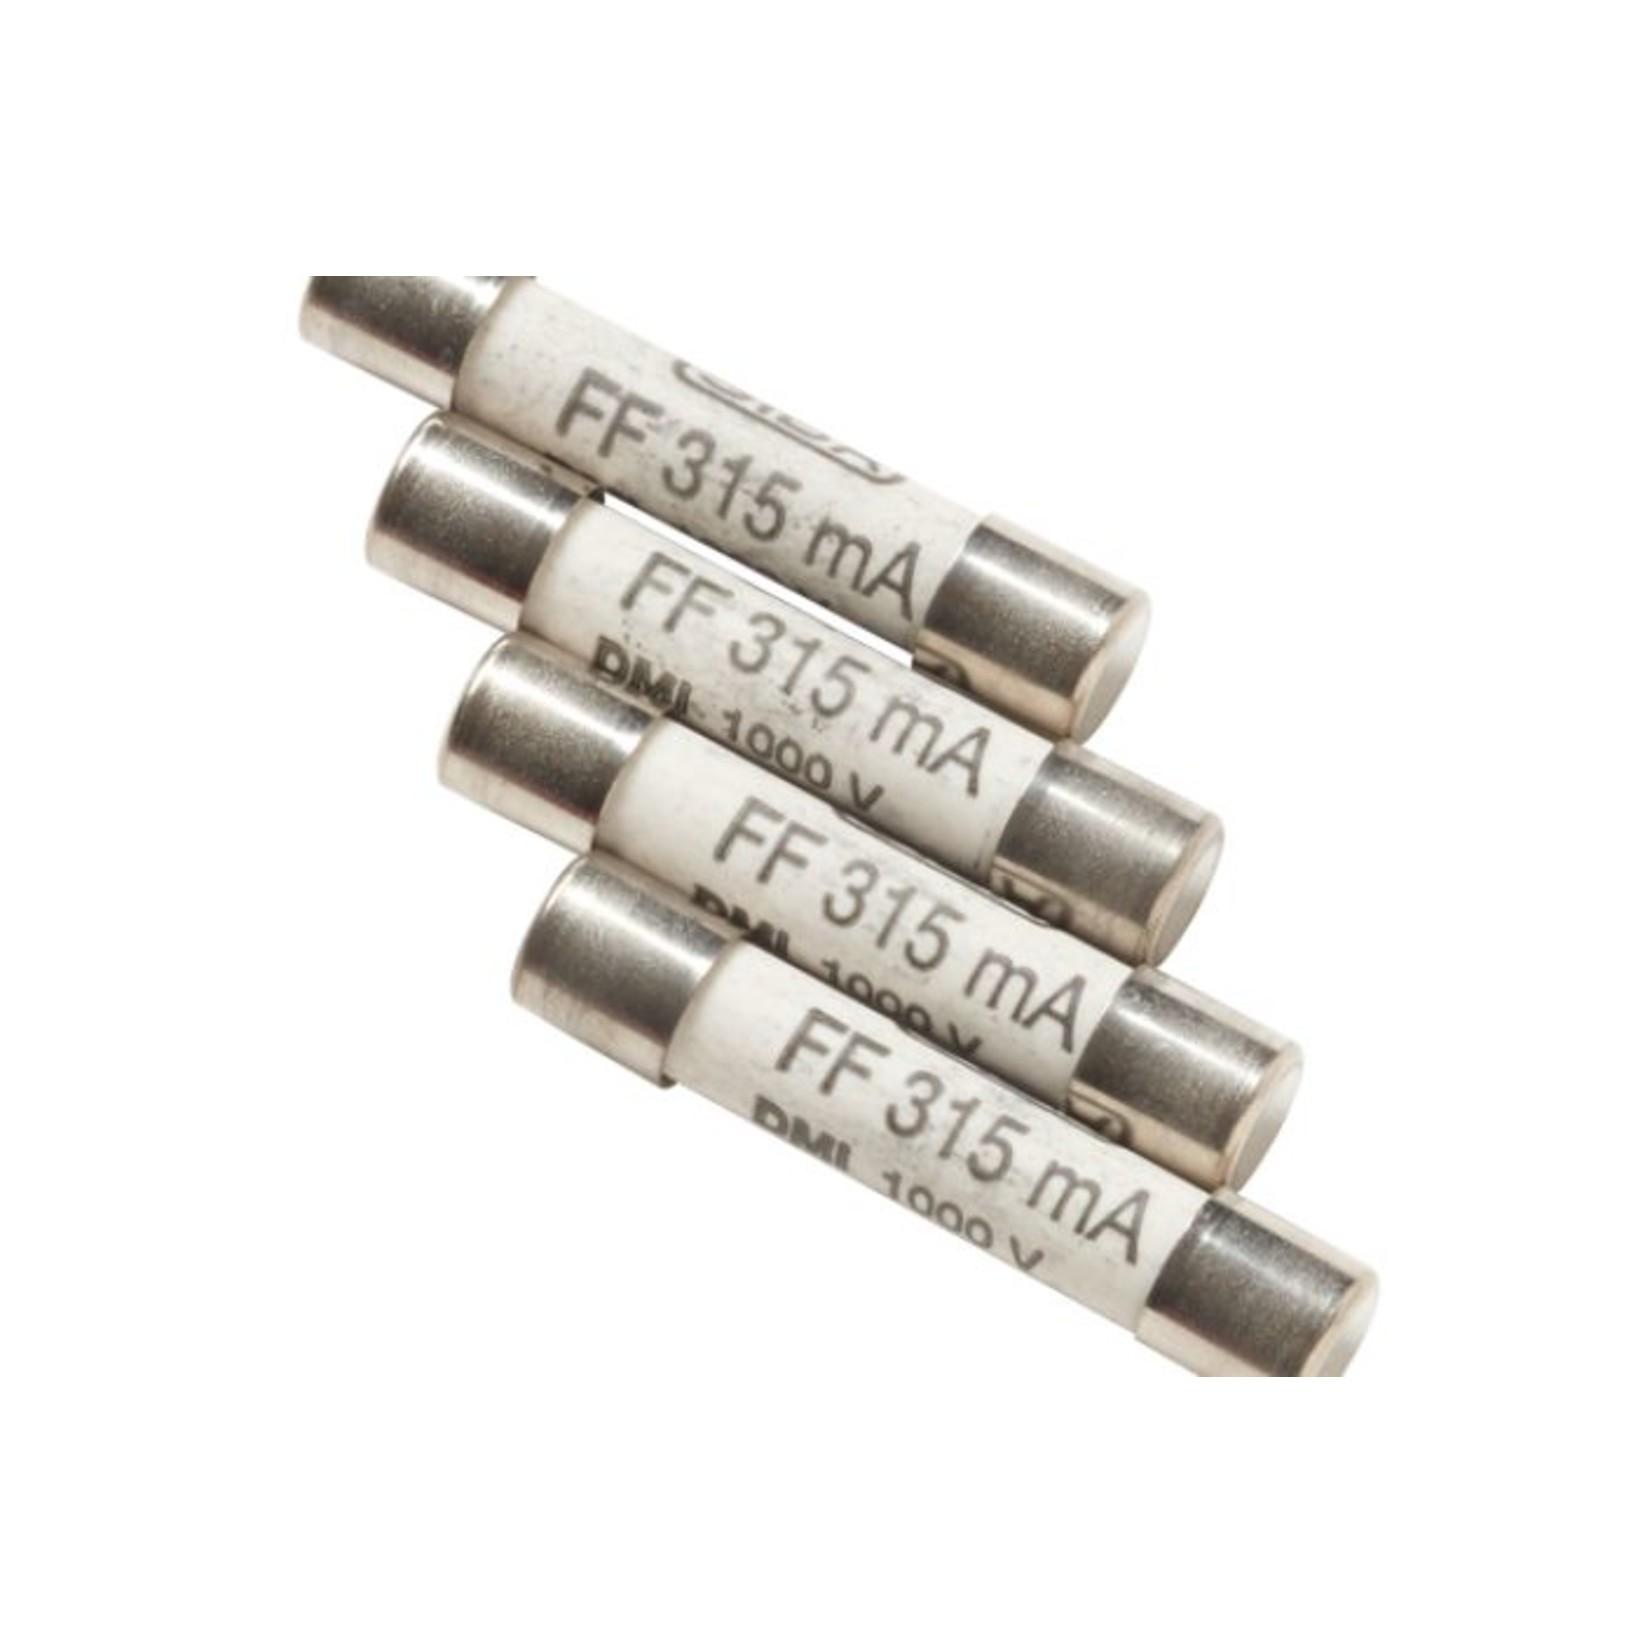 BEHA-AMPROBE FP300 Fuse Pack 4x 315mA/1000V